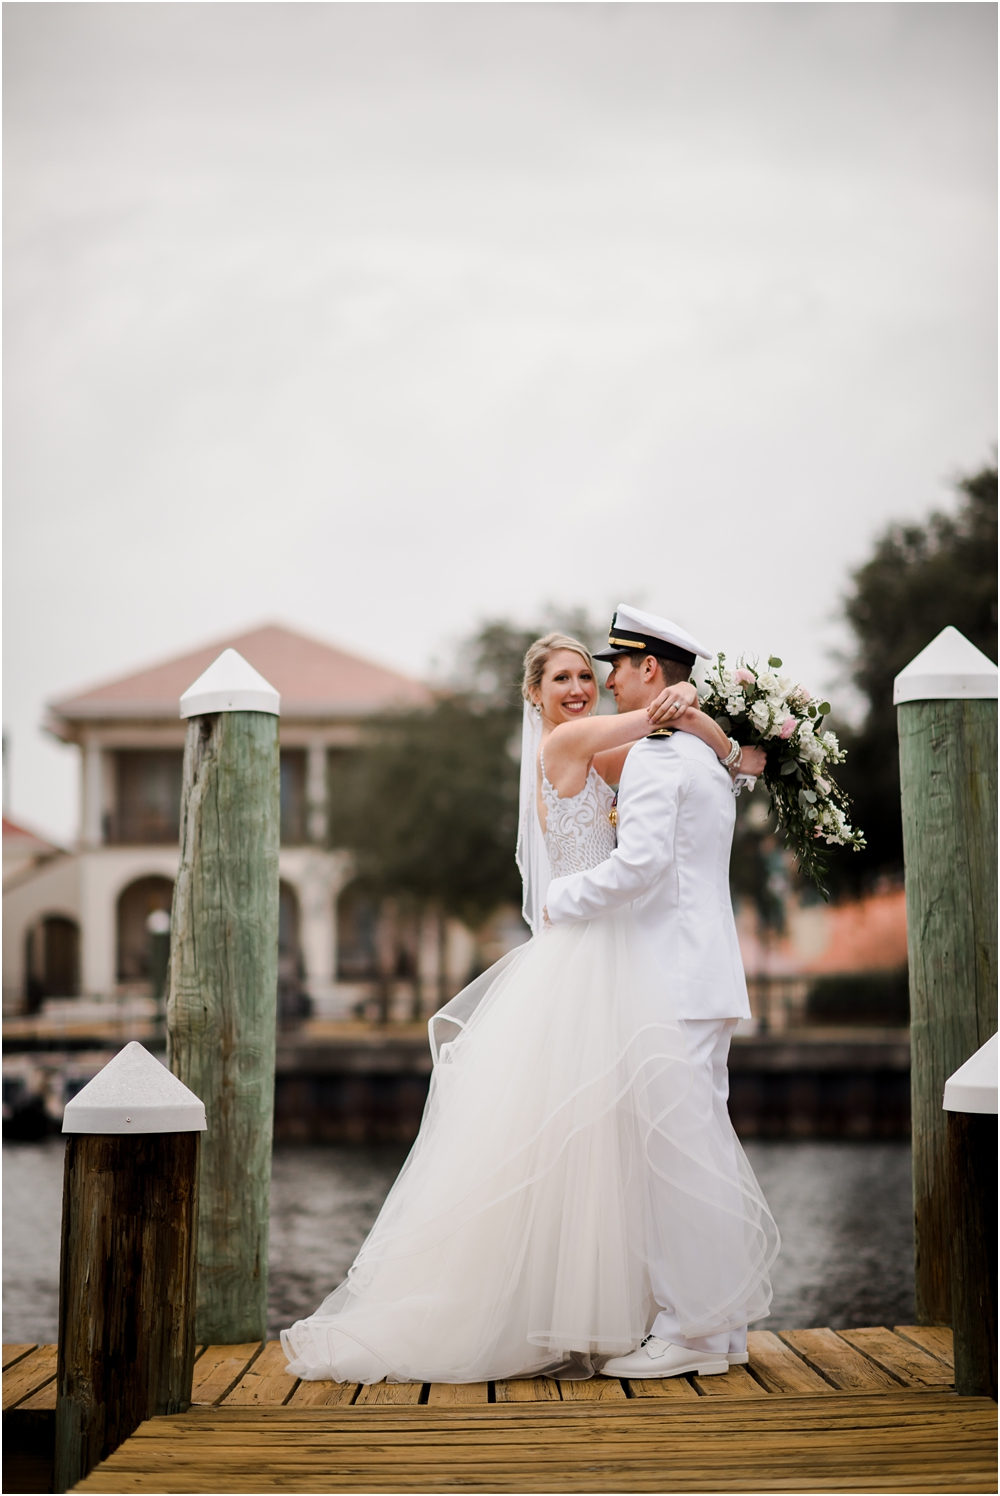 oconnor-pensacola-florida-wedding-photographer-kiersten-taylor-72.jpg